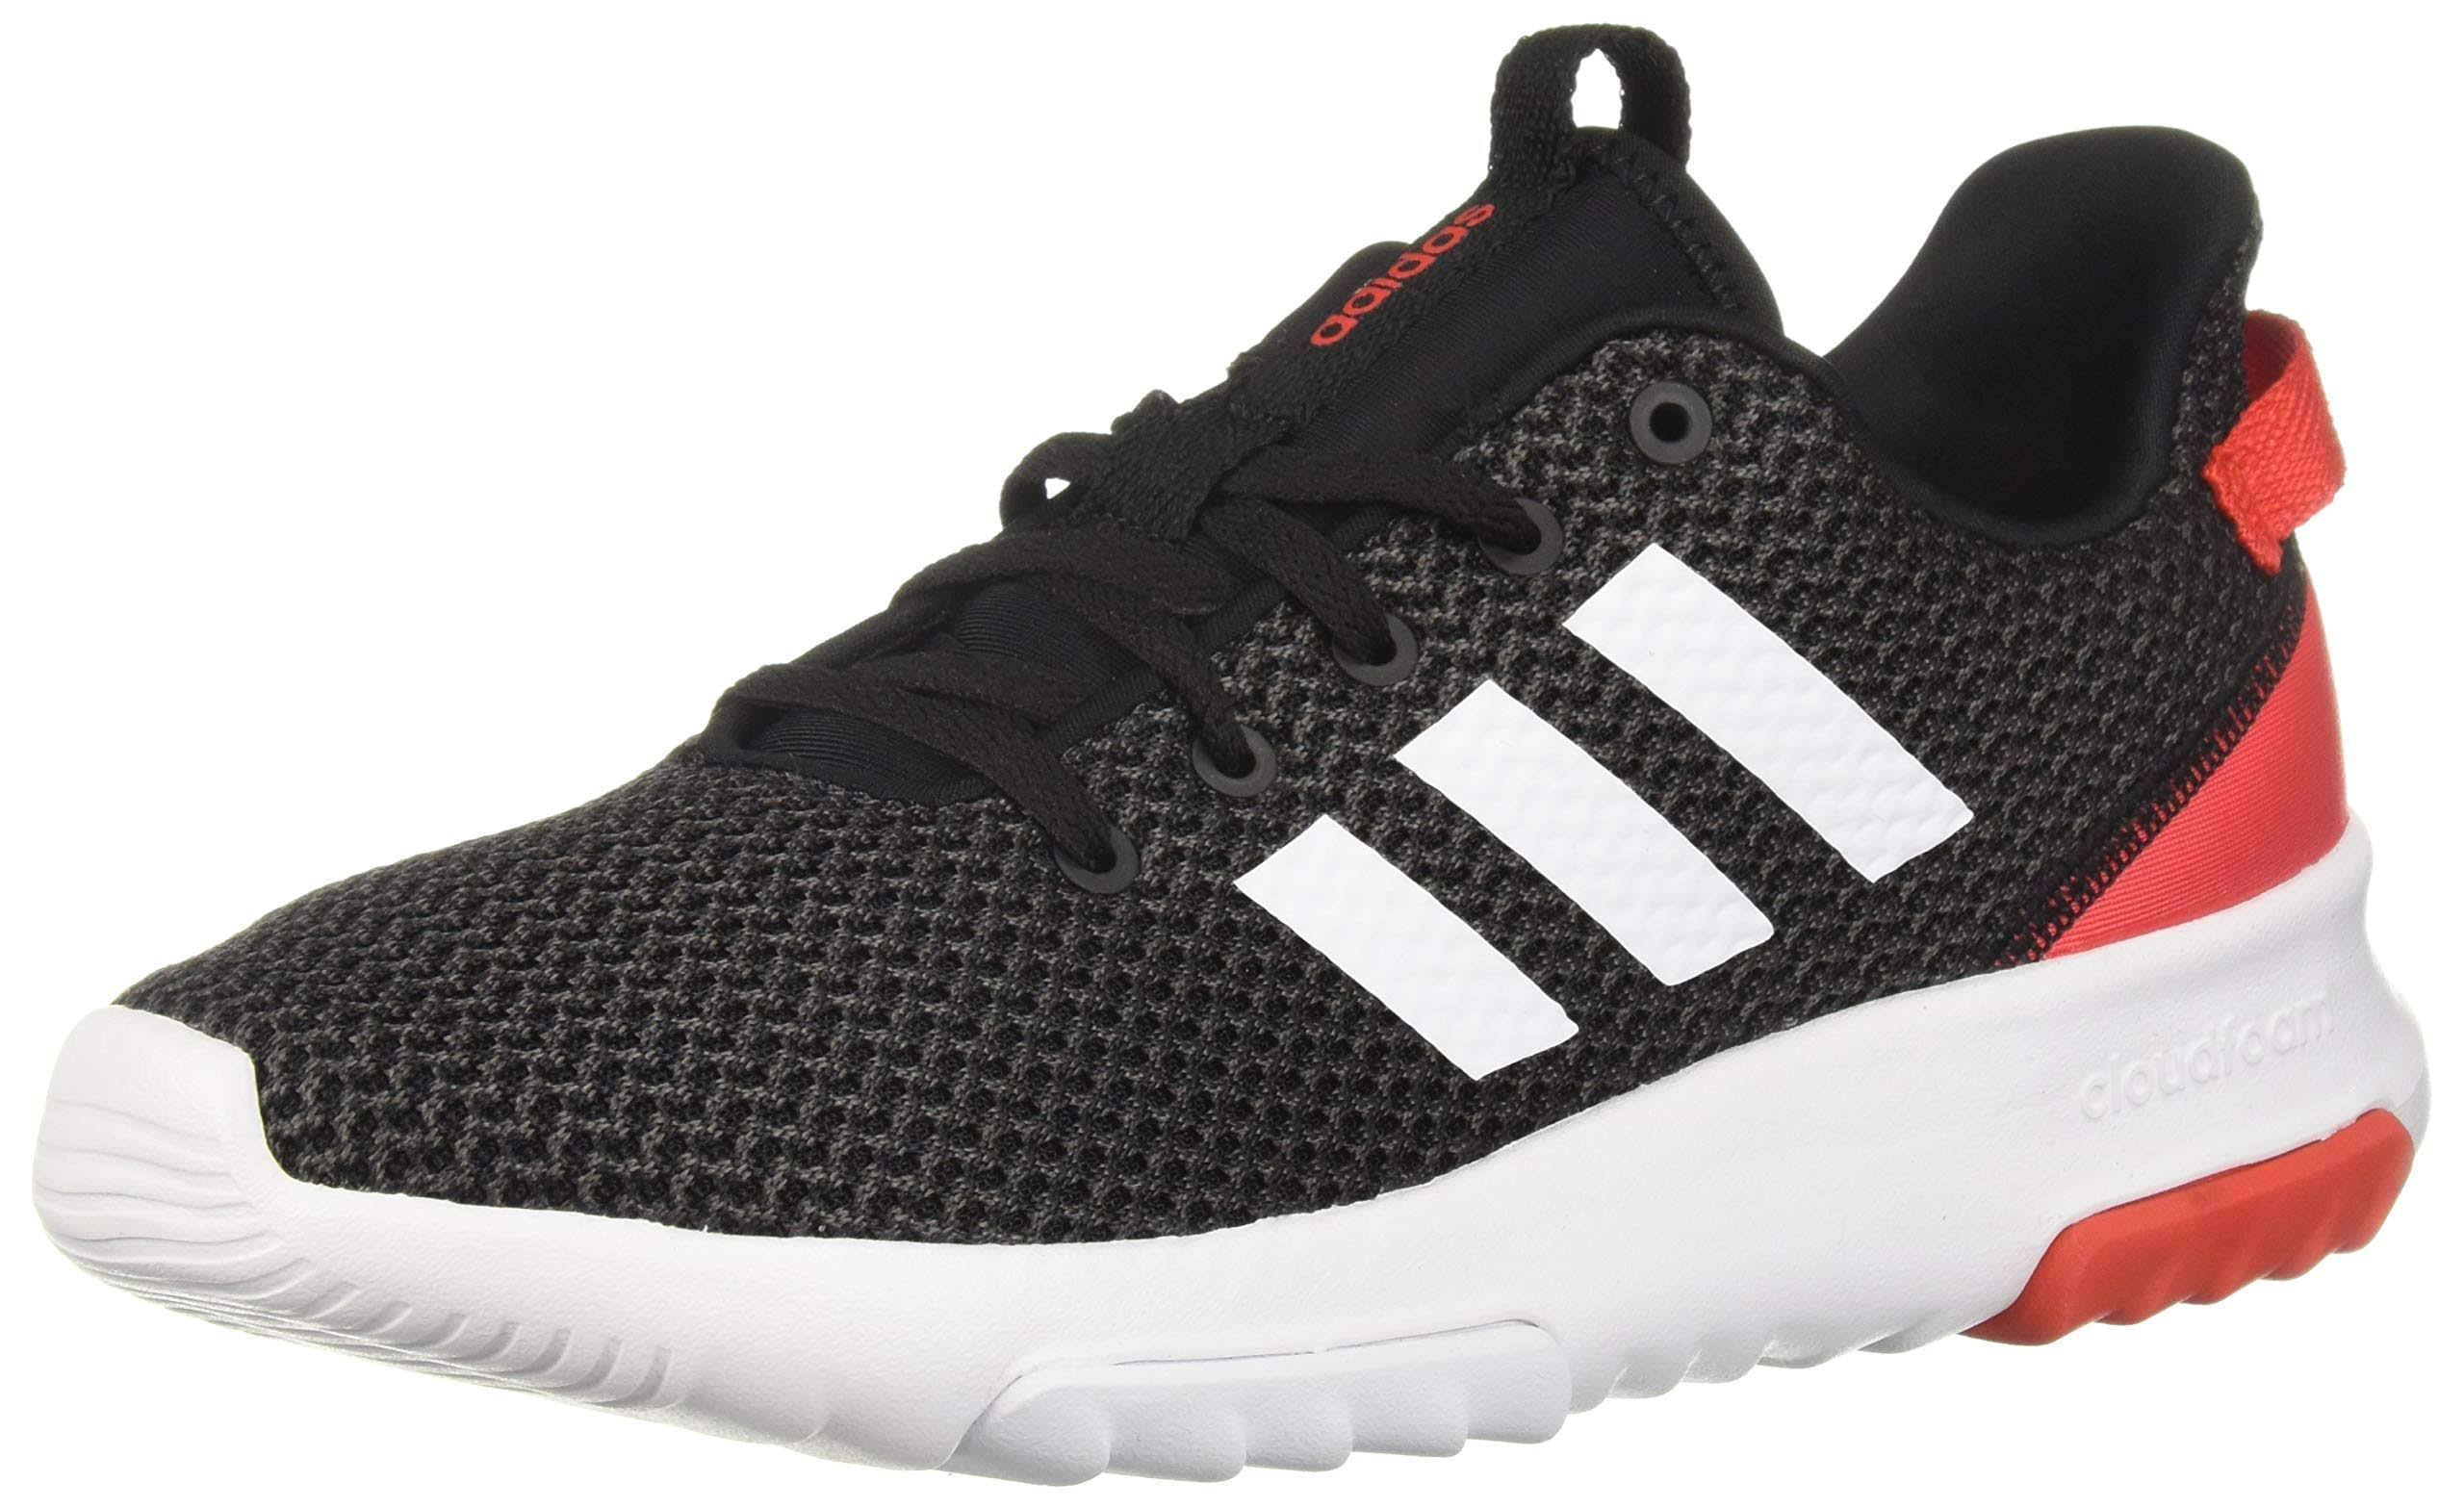 Adidas Shoes Tr Black Cloudfoam Racer Rojo Negro 12 Originales Hombres rcgnrW4